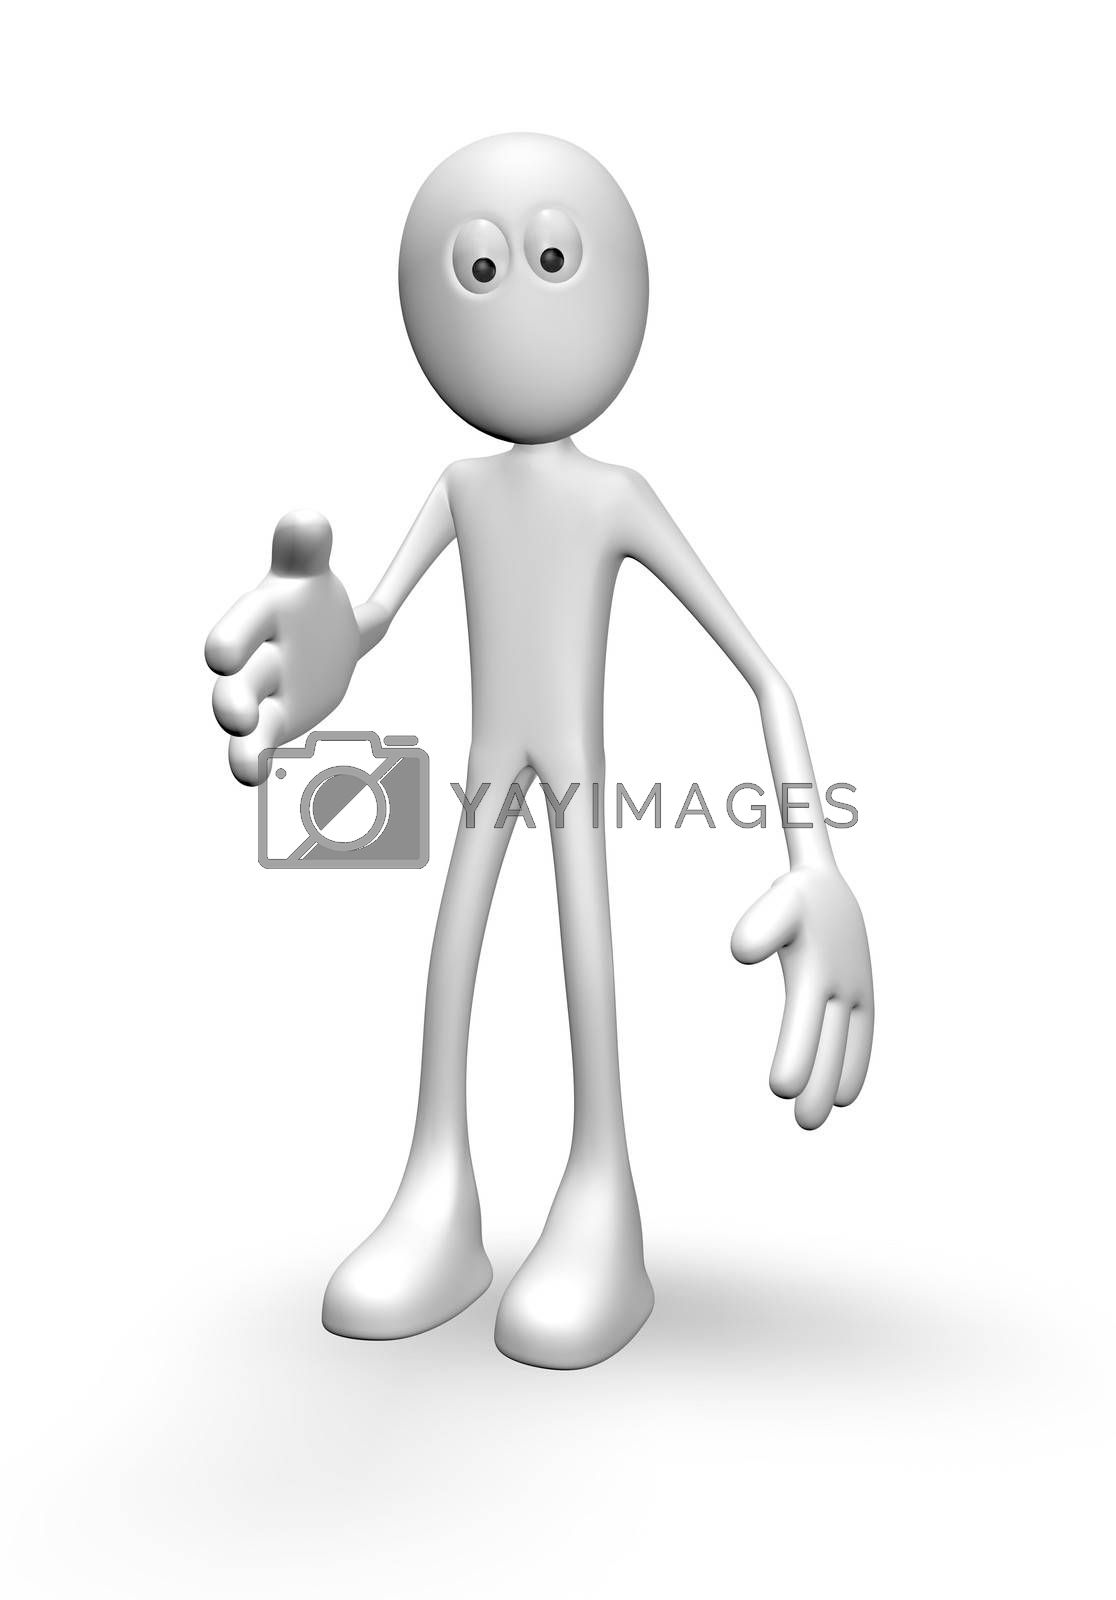 cartoon guy says hello - 3d illustration